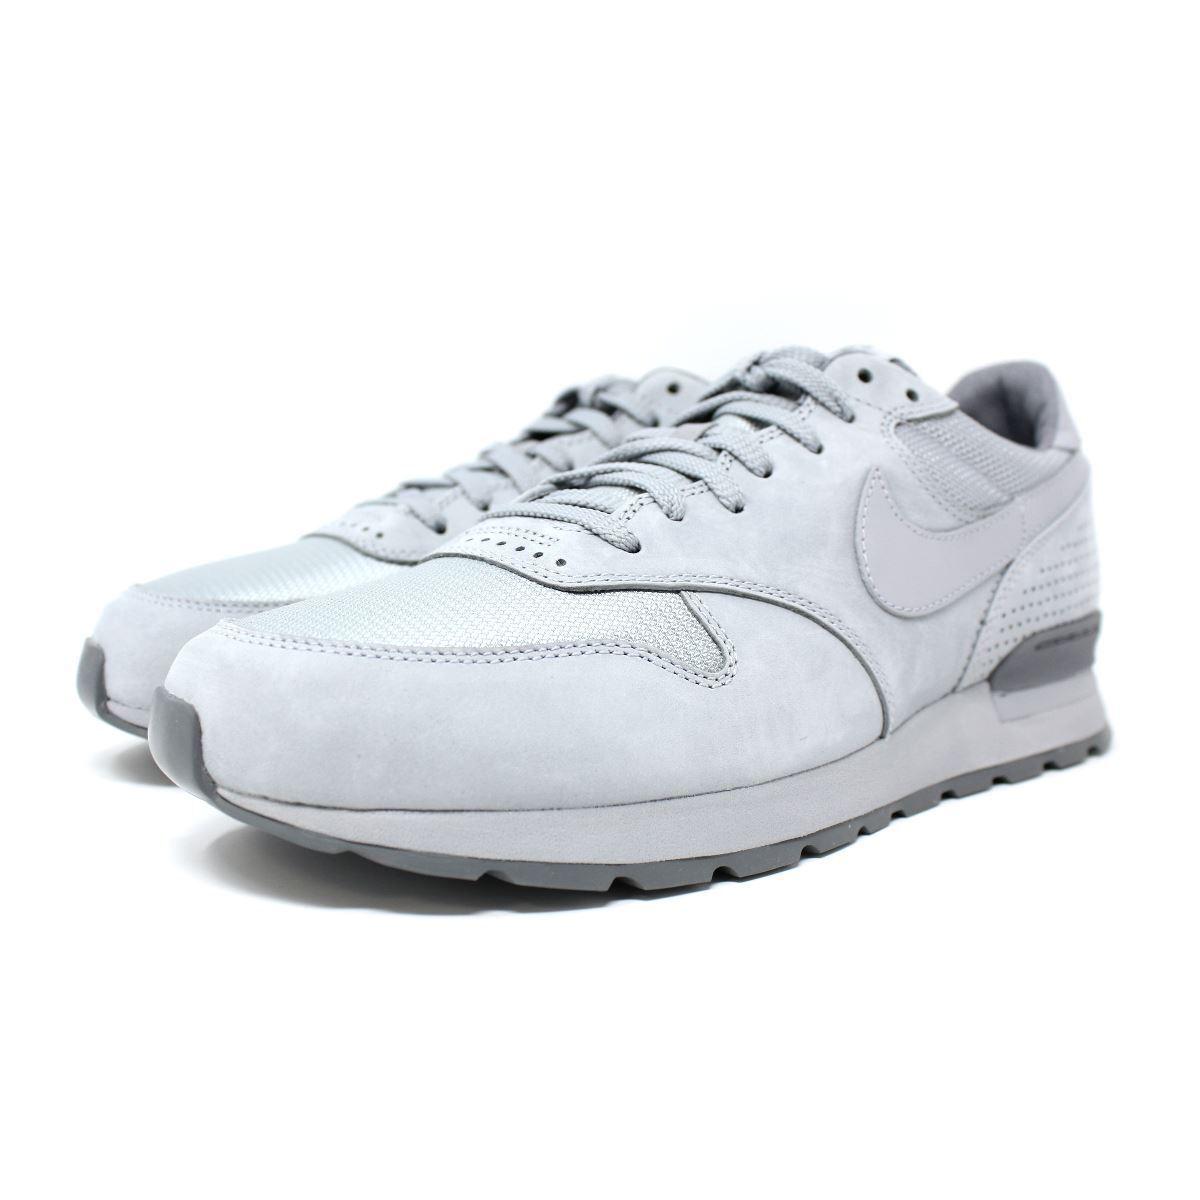 Nike air zoom epico luxe uomini sz - 13